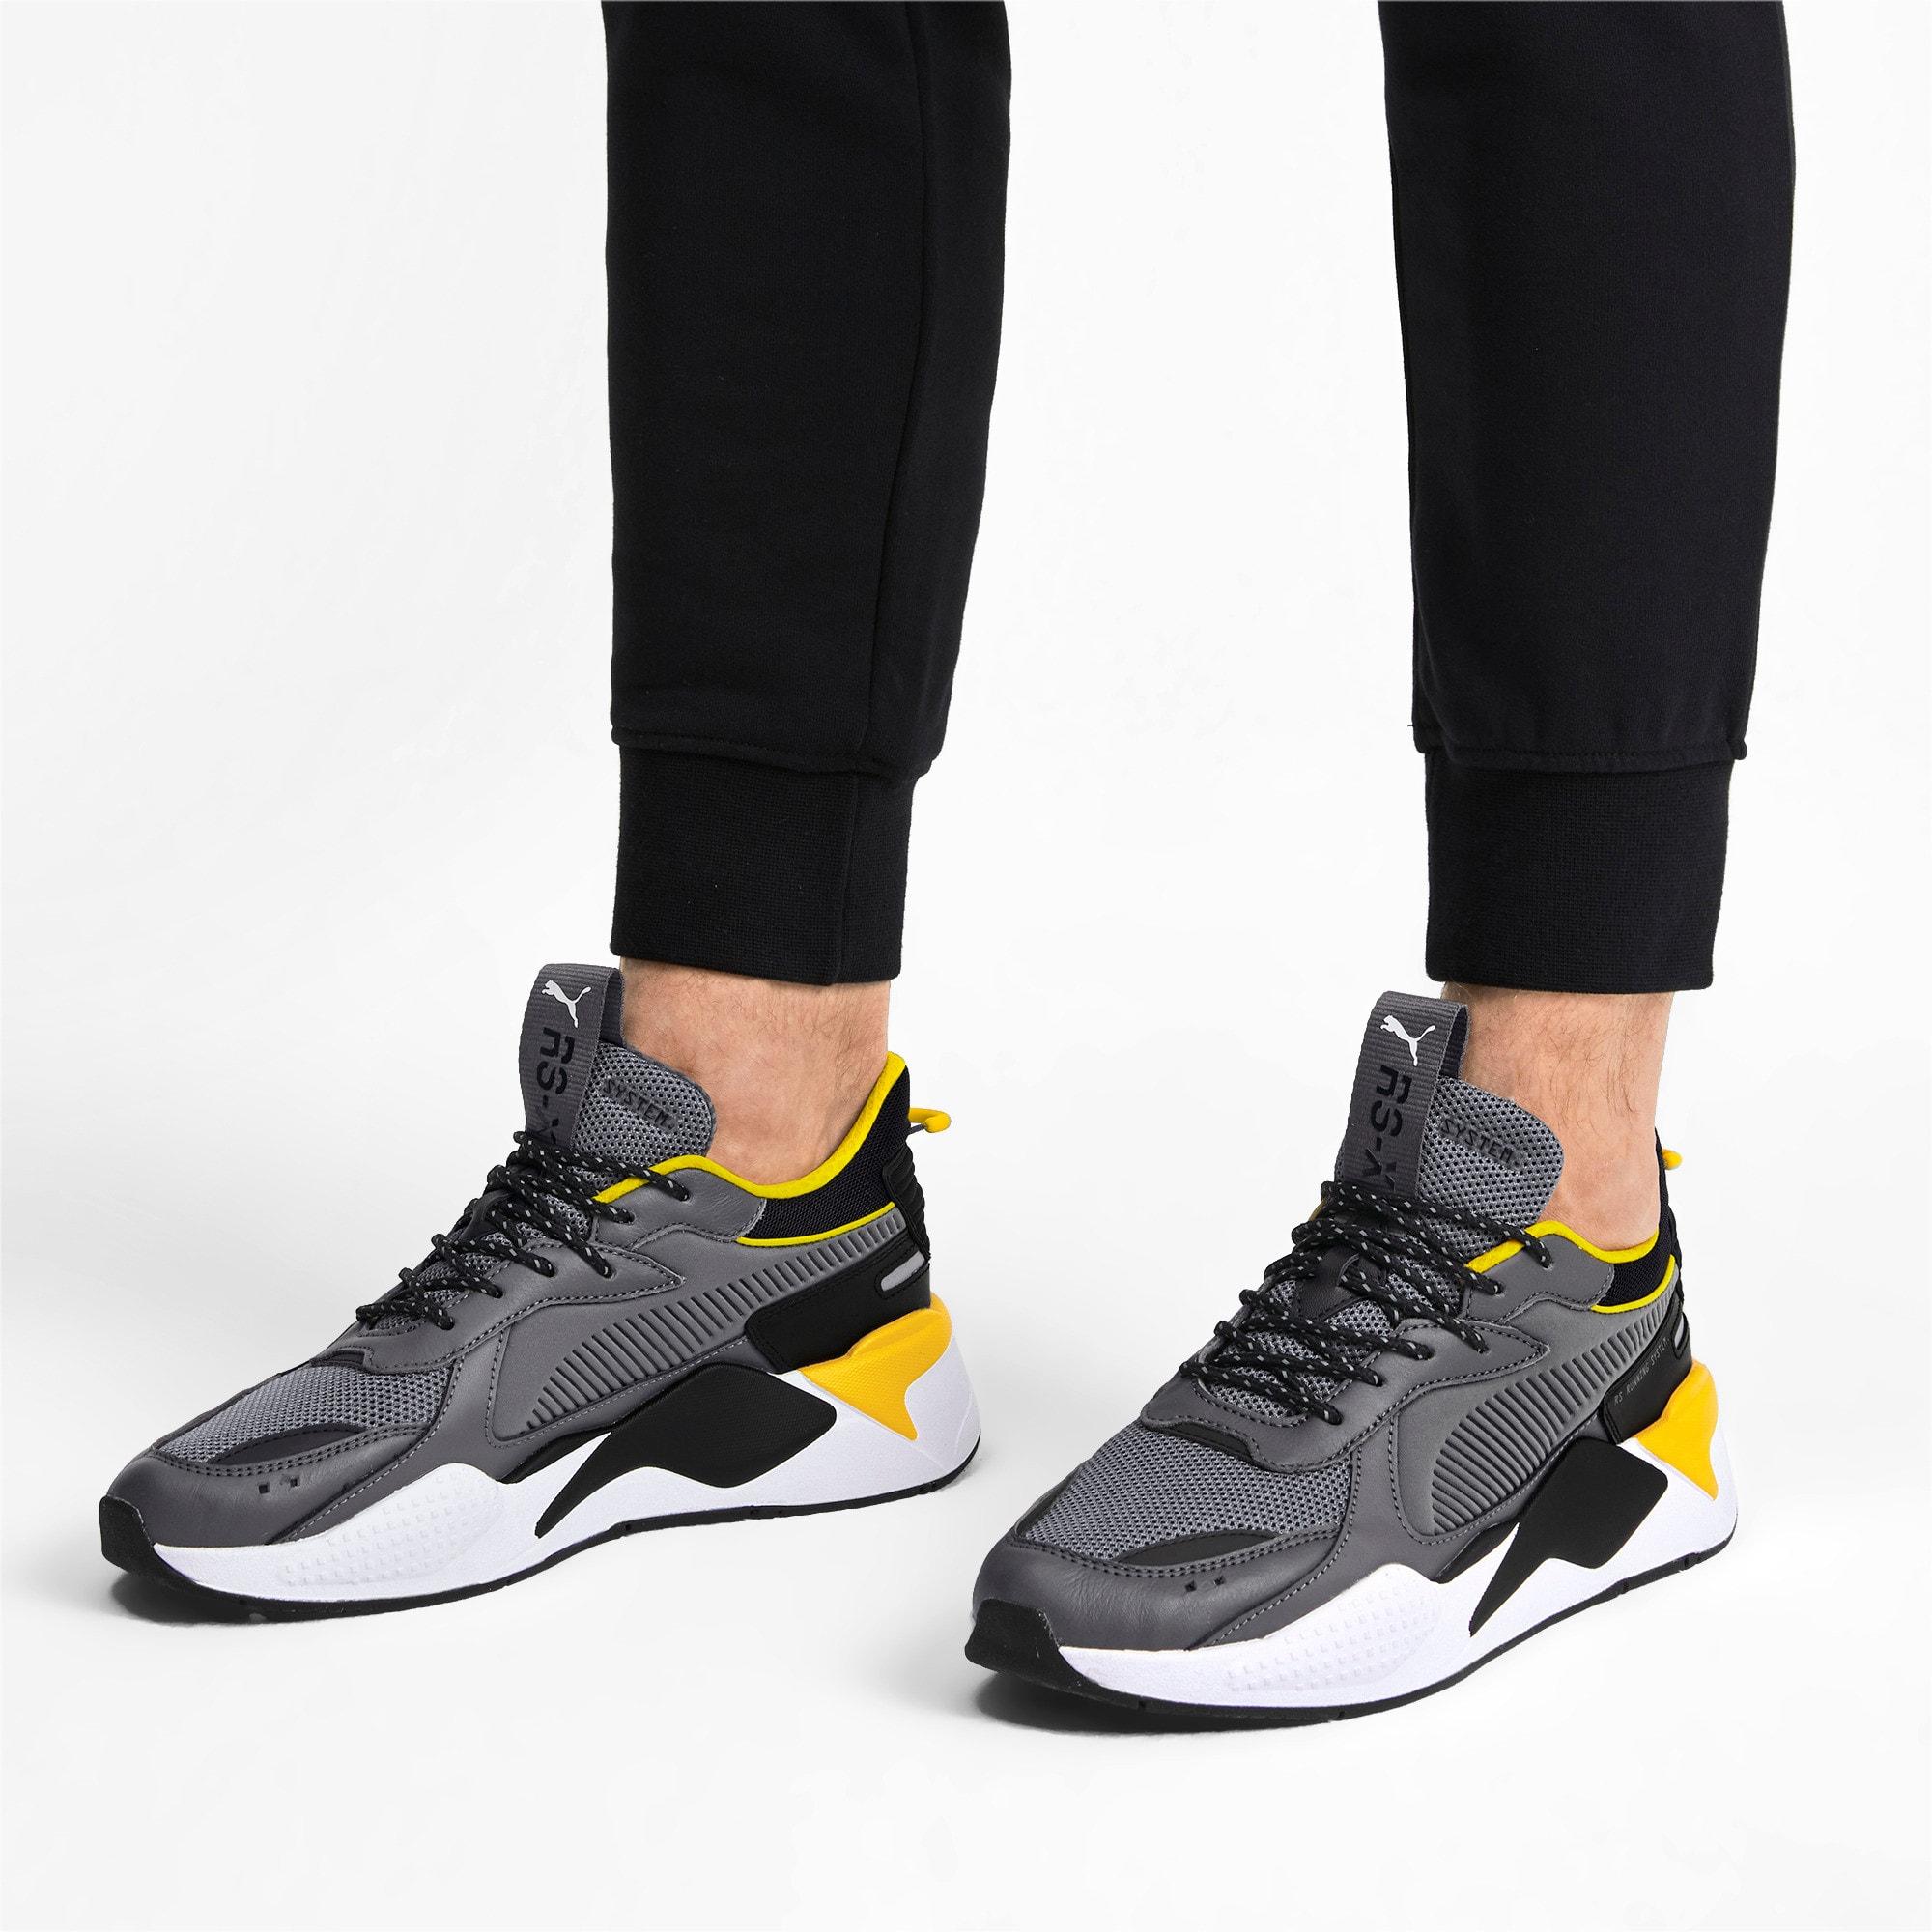 Thumbnail 2 of RS-X Core Sneakers, CASTLEROCK-Puma Black, medium